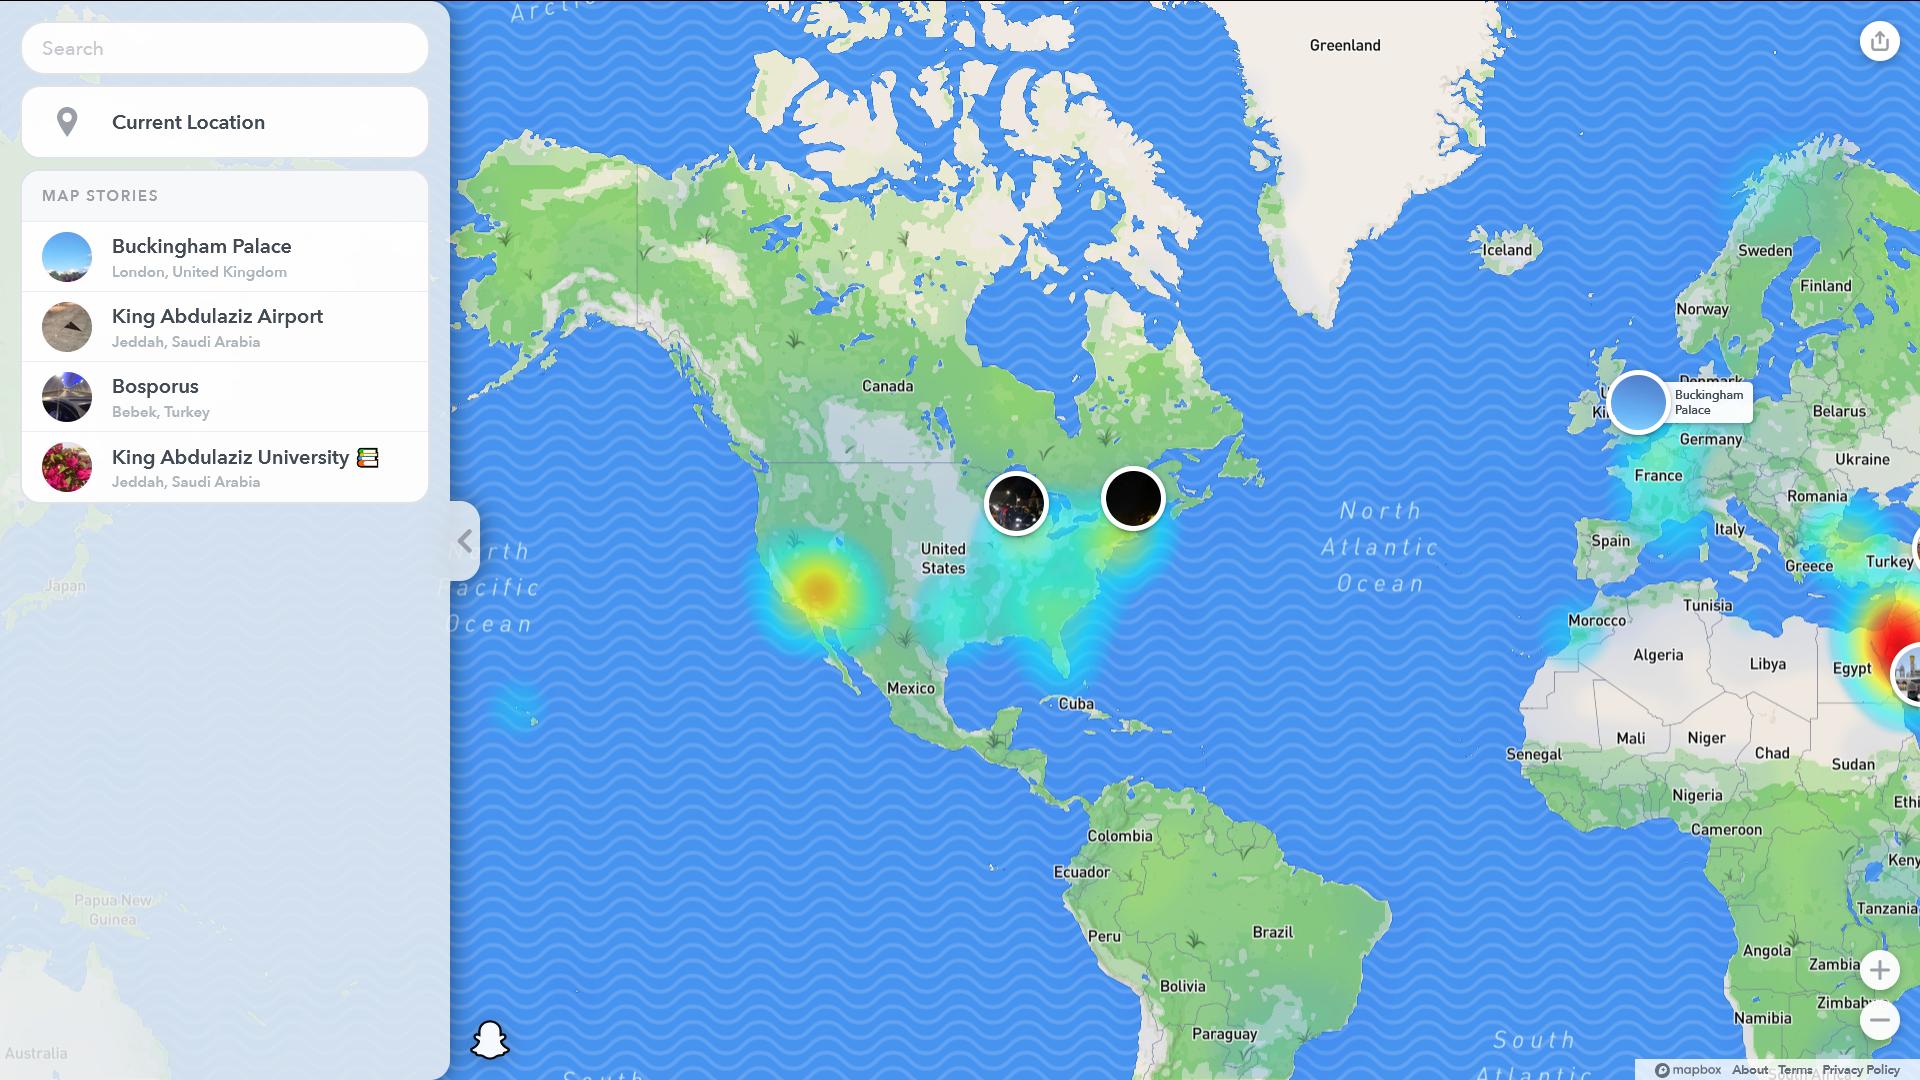 Maps.snapchat.com